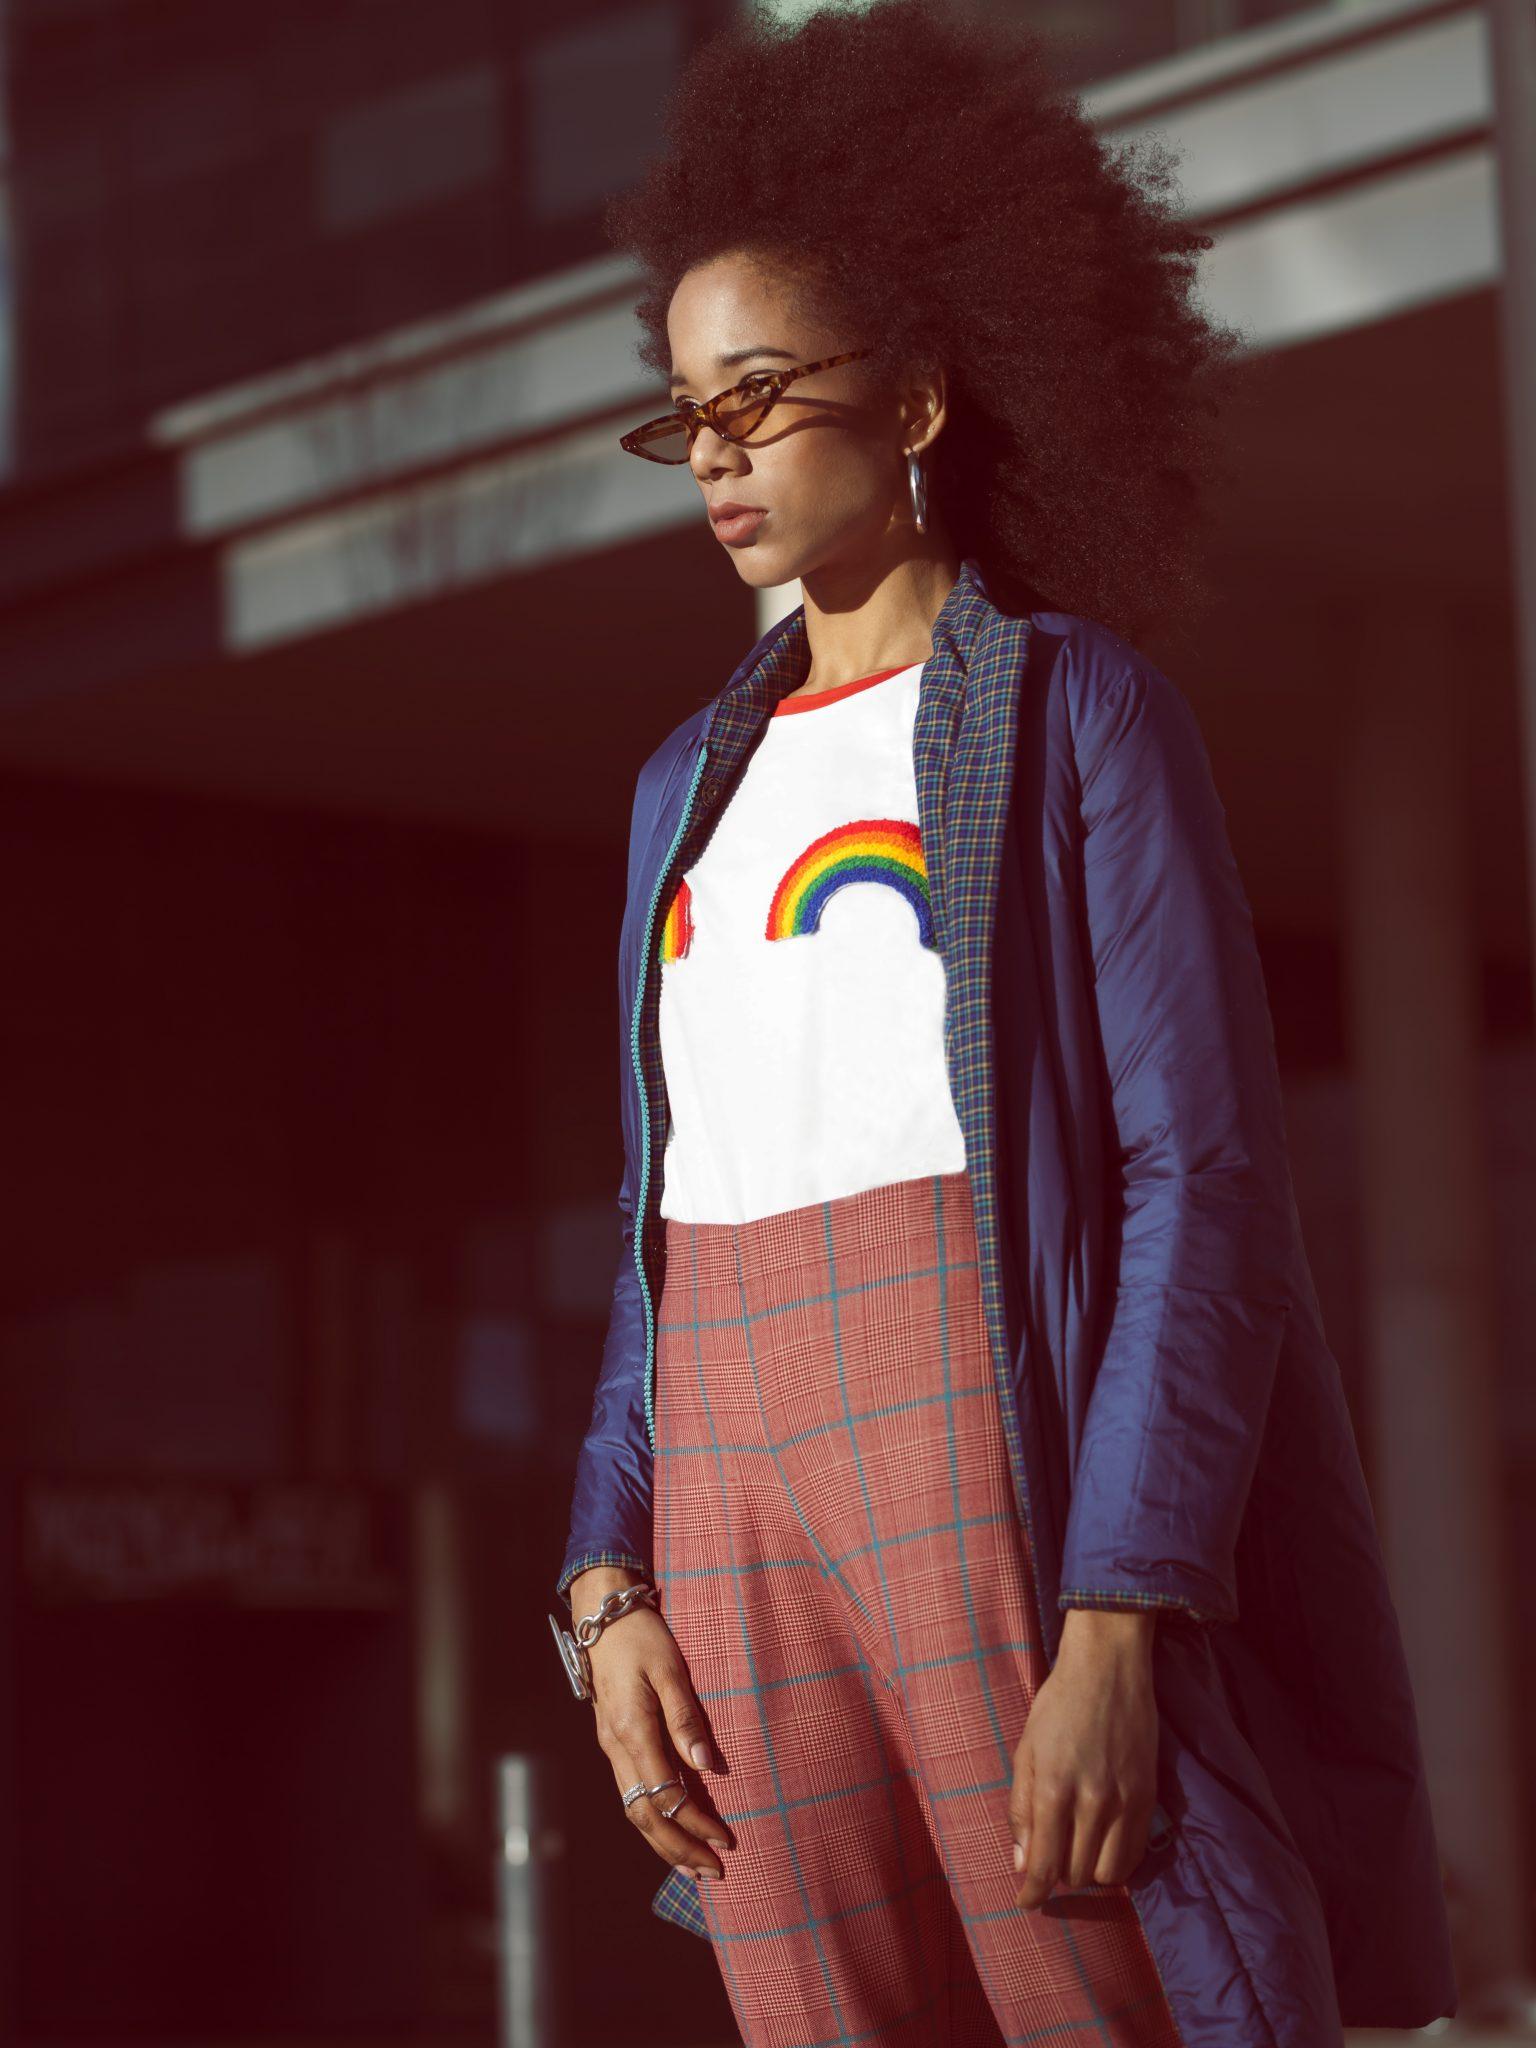 to hang around lazaro scabbia fashion photography afro beauty editorial le dernier etage webditorial magazine